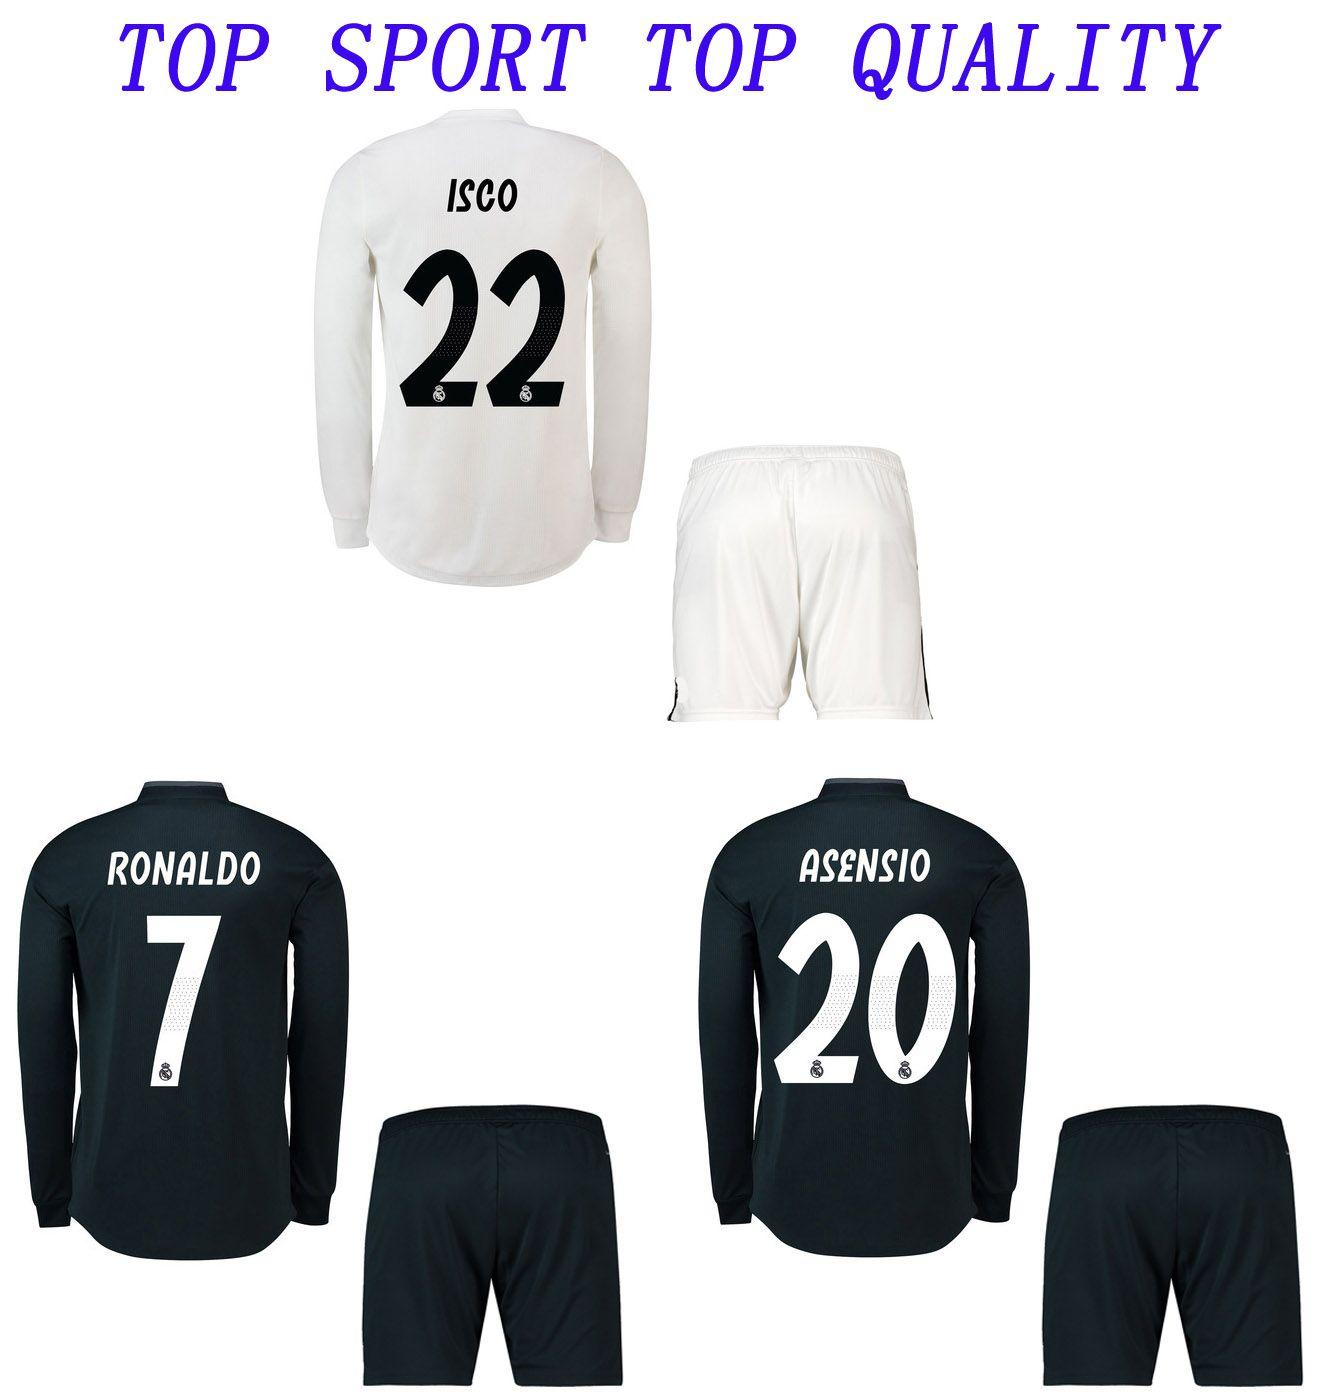 1e4cf37778e4d Compre Real Madrid Camisetas De Fútbol De Manga Larga Adultos Uniformes De  Fútbol Hombres De Calidad Tailandesa Kits De Deportes En Casa Fuera  Terceros ...